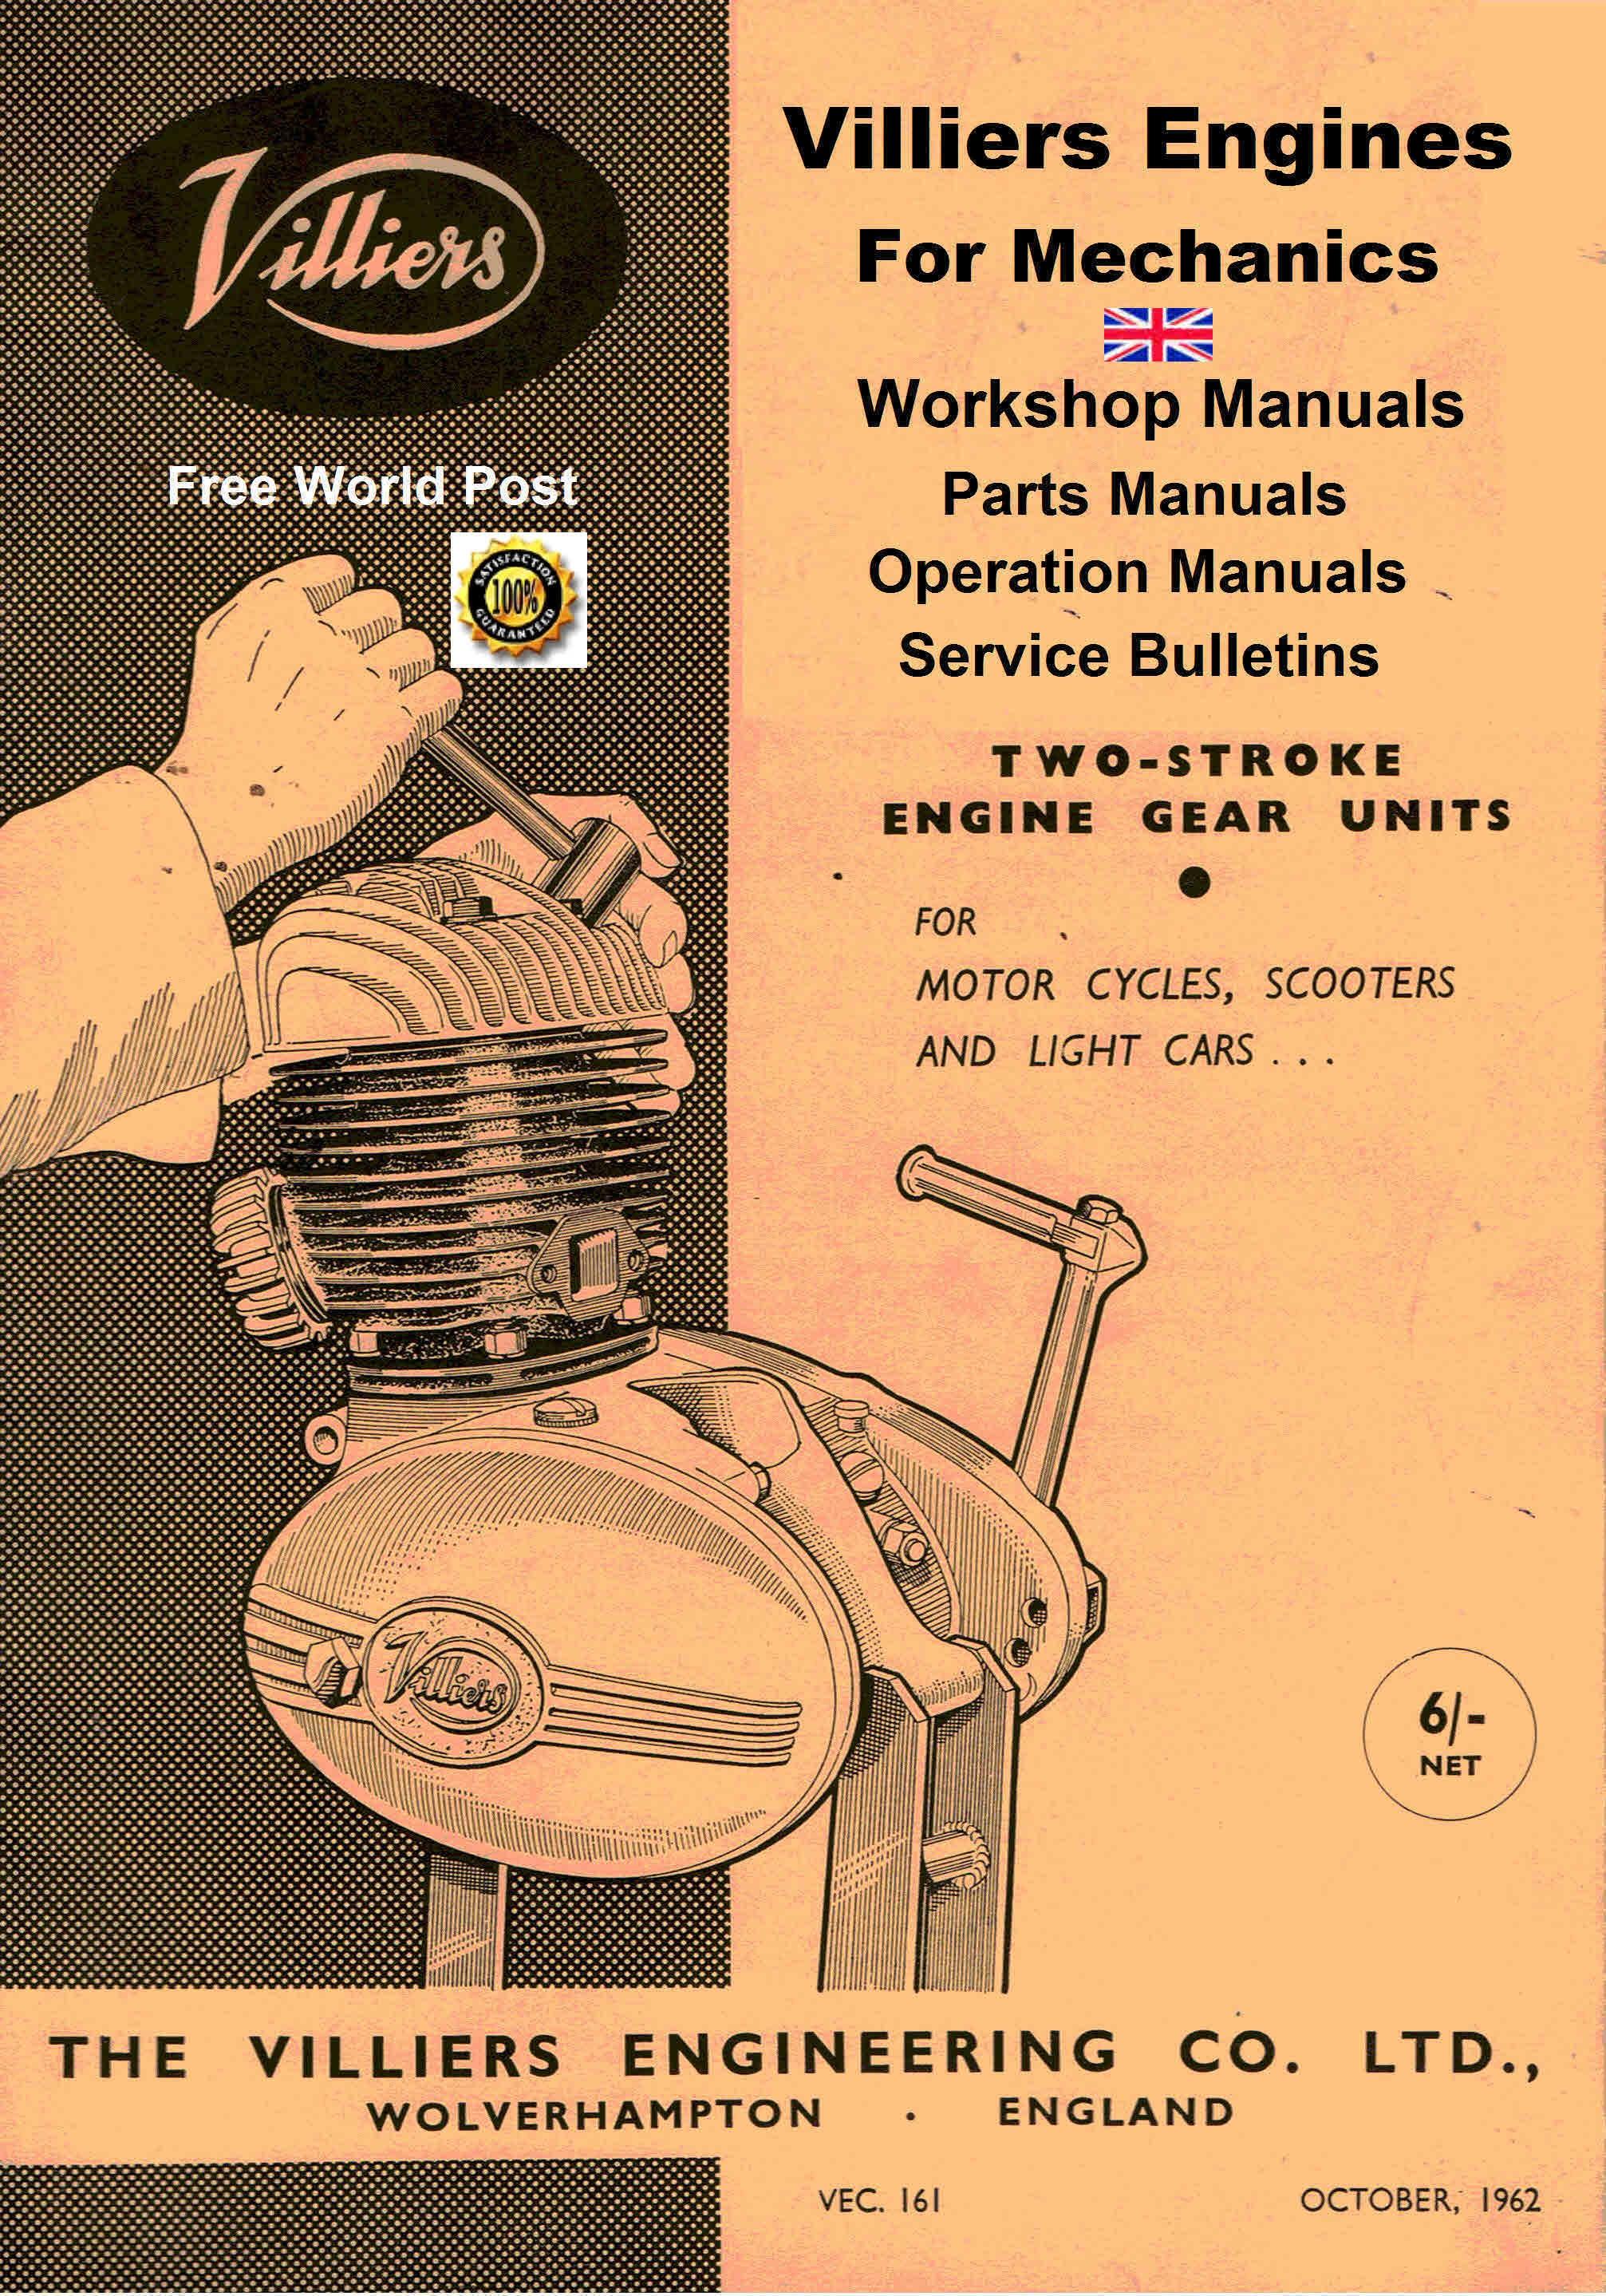 villiers engine service manuals for mechanics rh sellfy com Mk12 Mod 1 Mk12 Navy SEAL